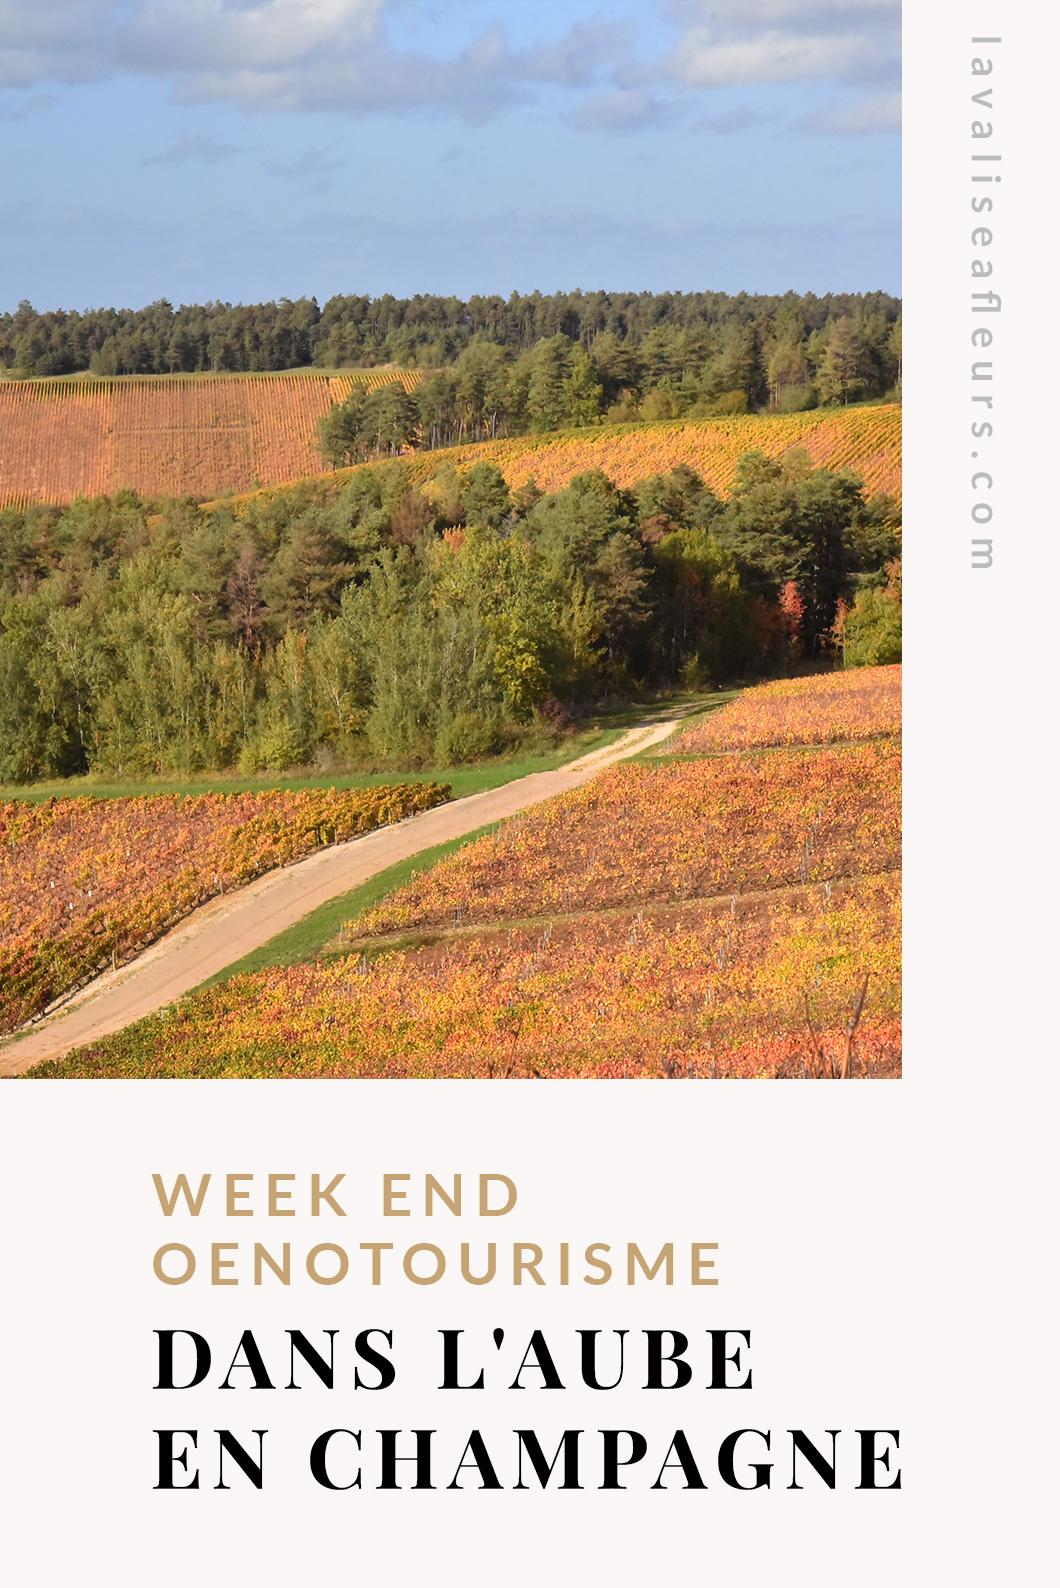 Week end oenotourisme dans l'Aube en champagne